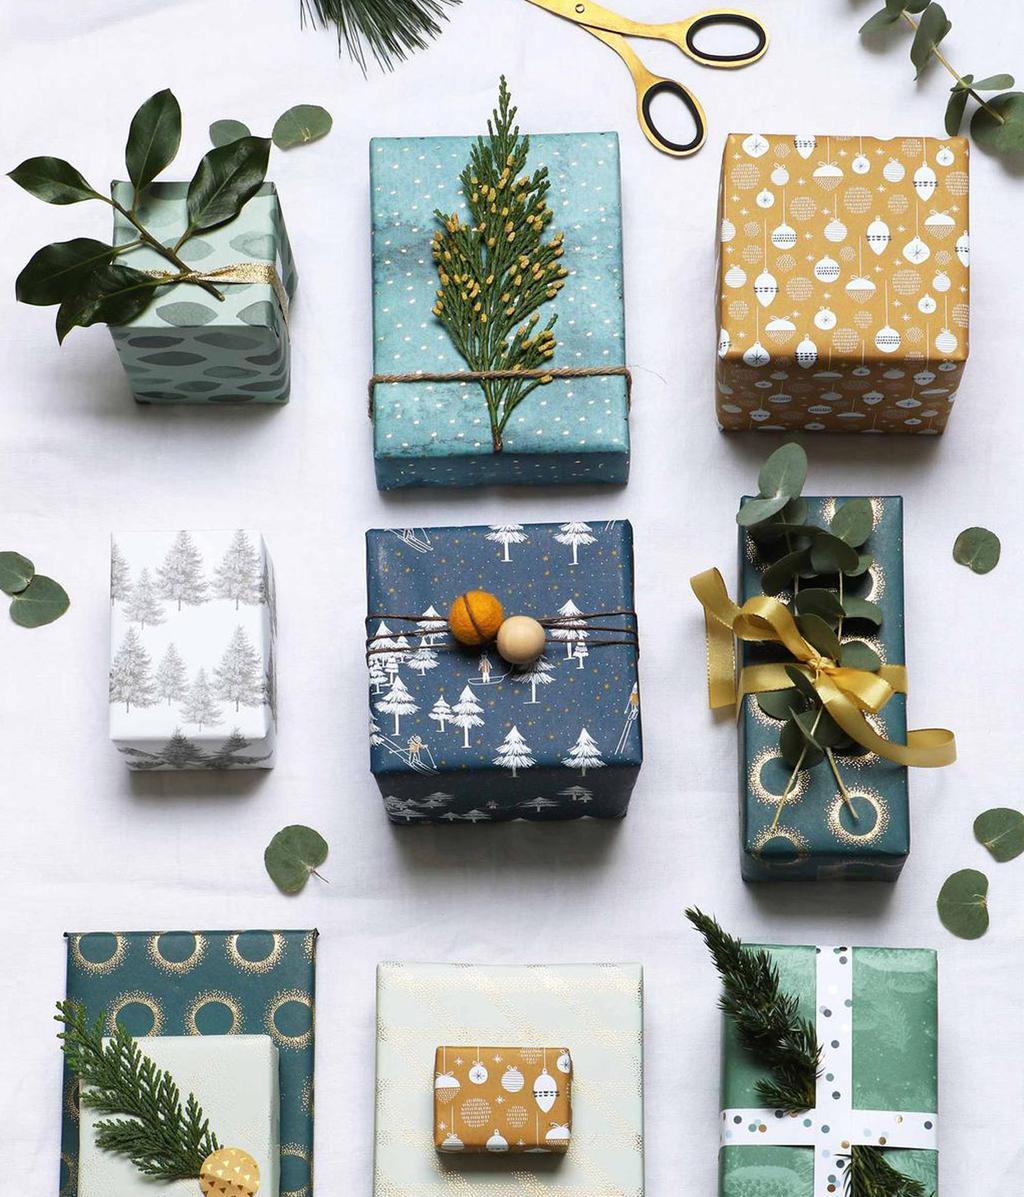 Cadeaus inpakken met groen | DIY | vtwonen